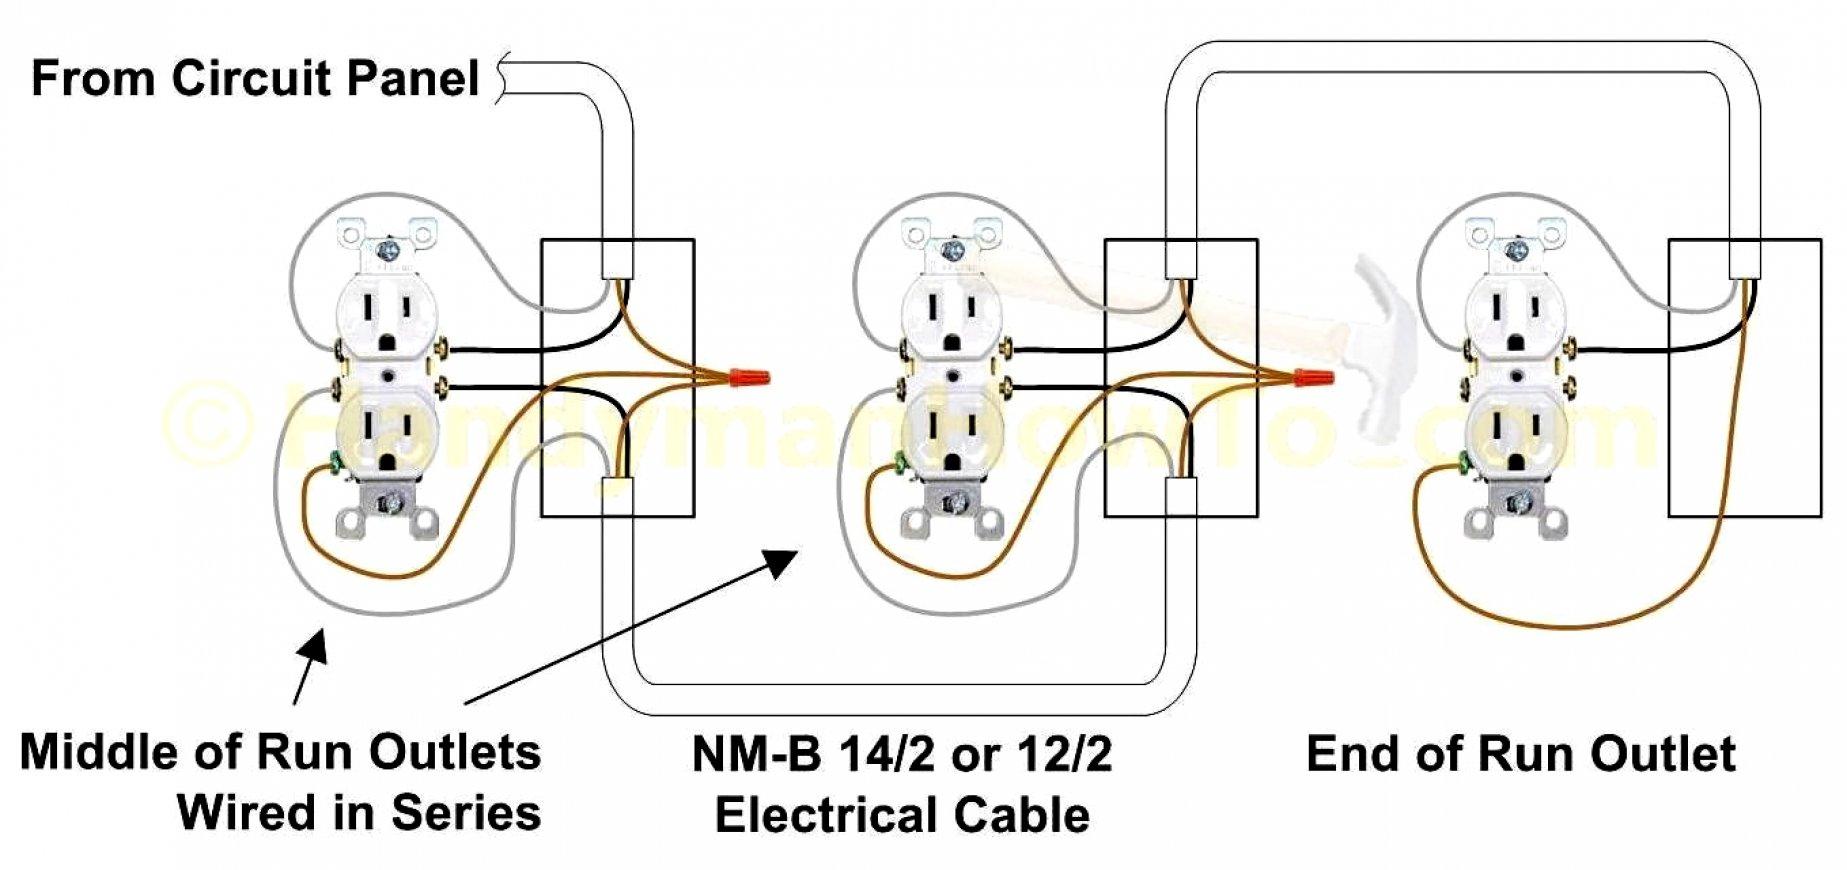 Home Plug Wiring | Wiring Diagram Libraries - Electrical Plug Wiring Diagram